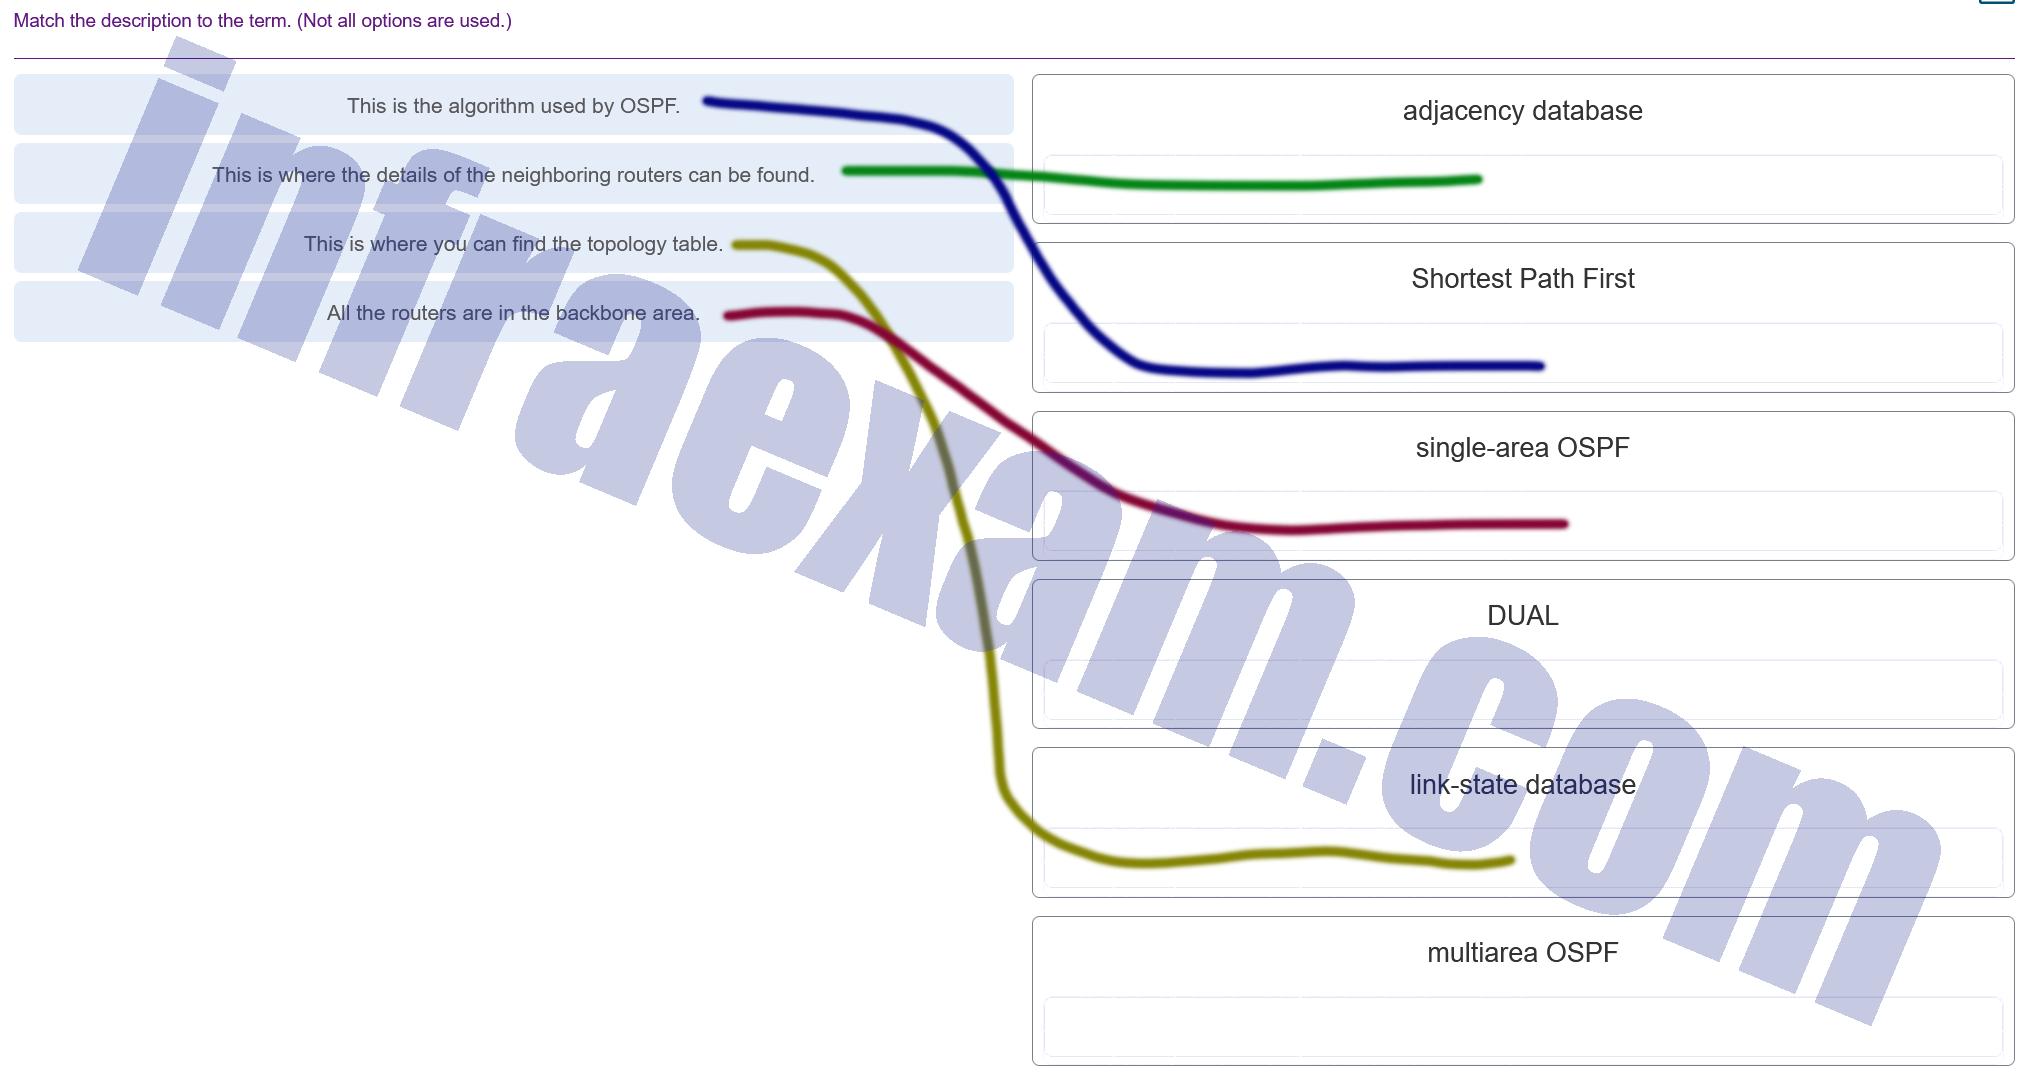 CCNA3 v7 – ENSA – Modules 1 – 2 OSPF Concepts and Configuration Exam Answers 0០3